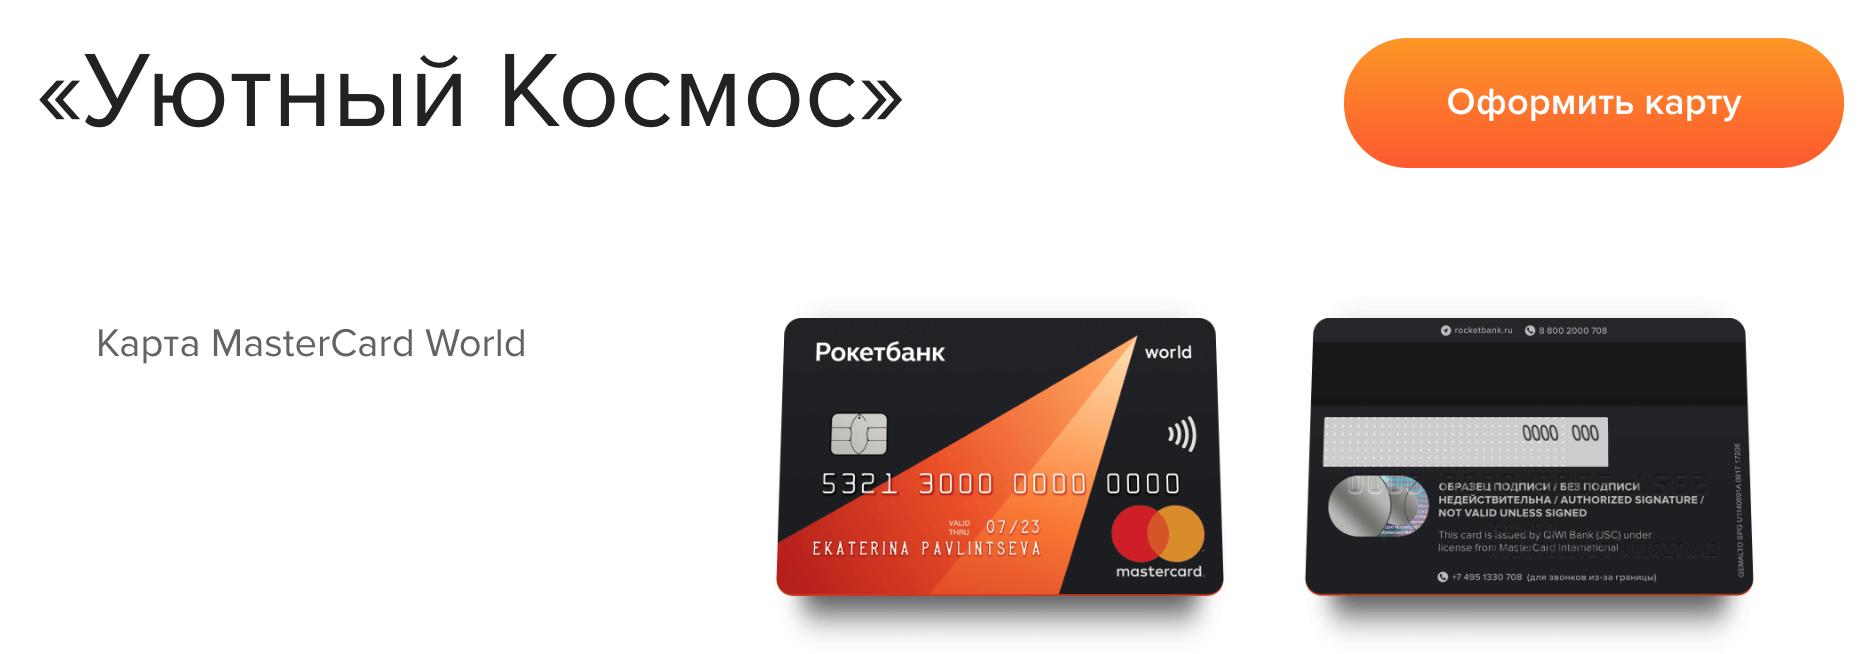 roketbank-kreditnaya-karta_1